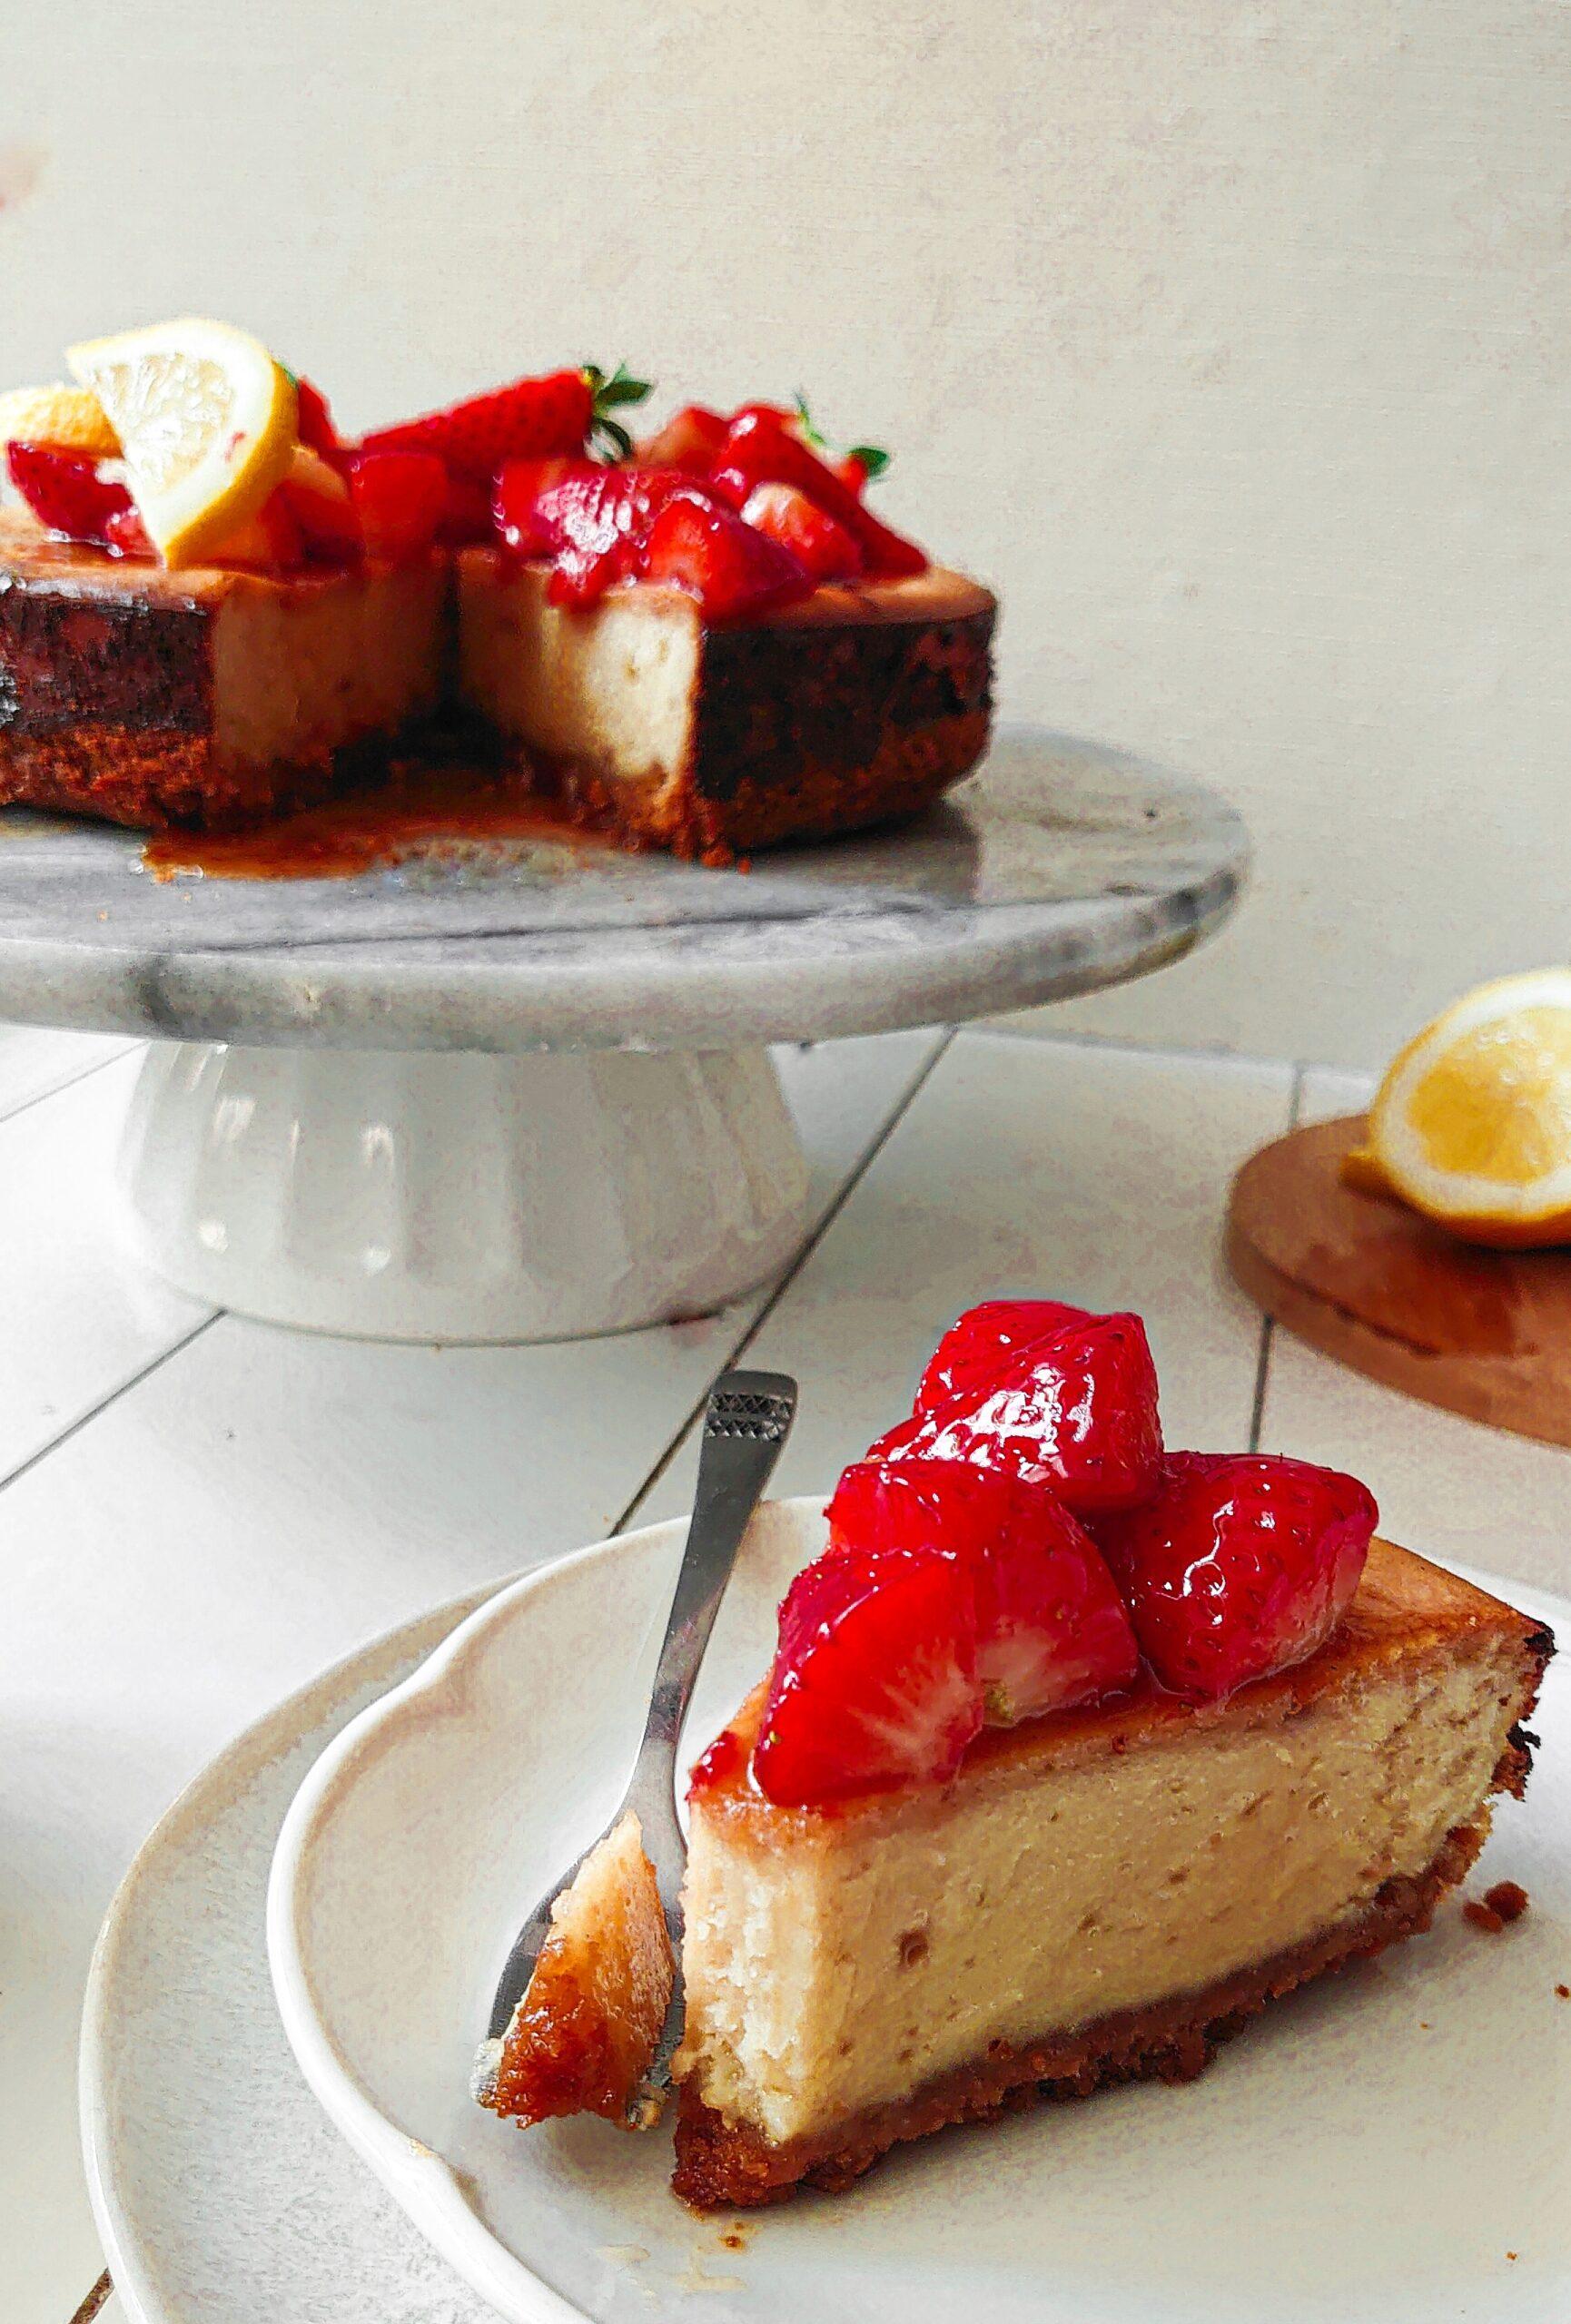 Vegan cheesecake met aardbeien en citroen